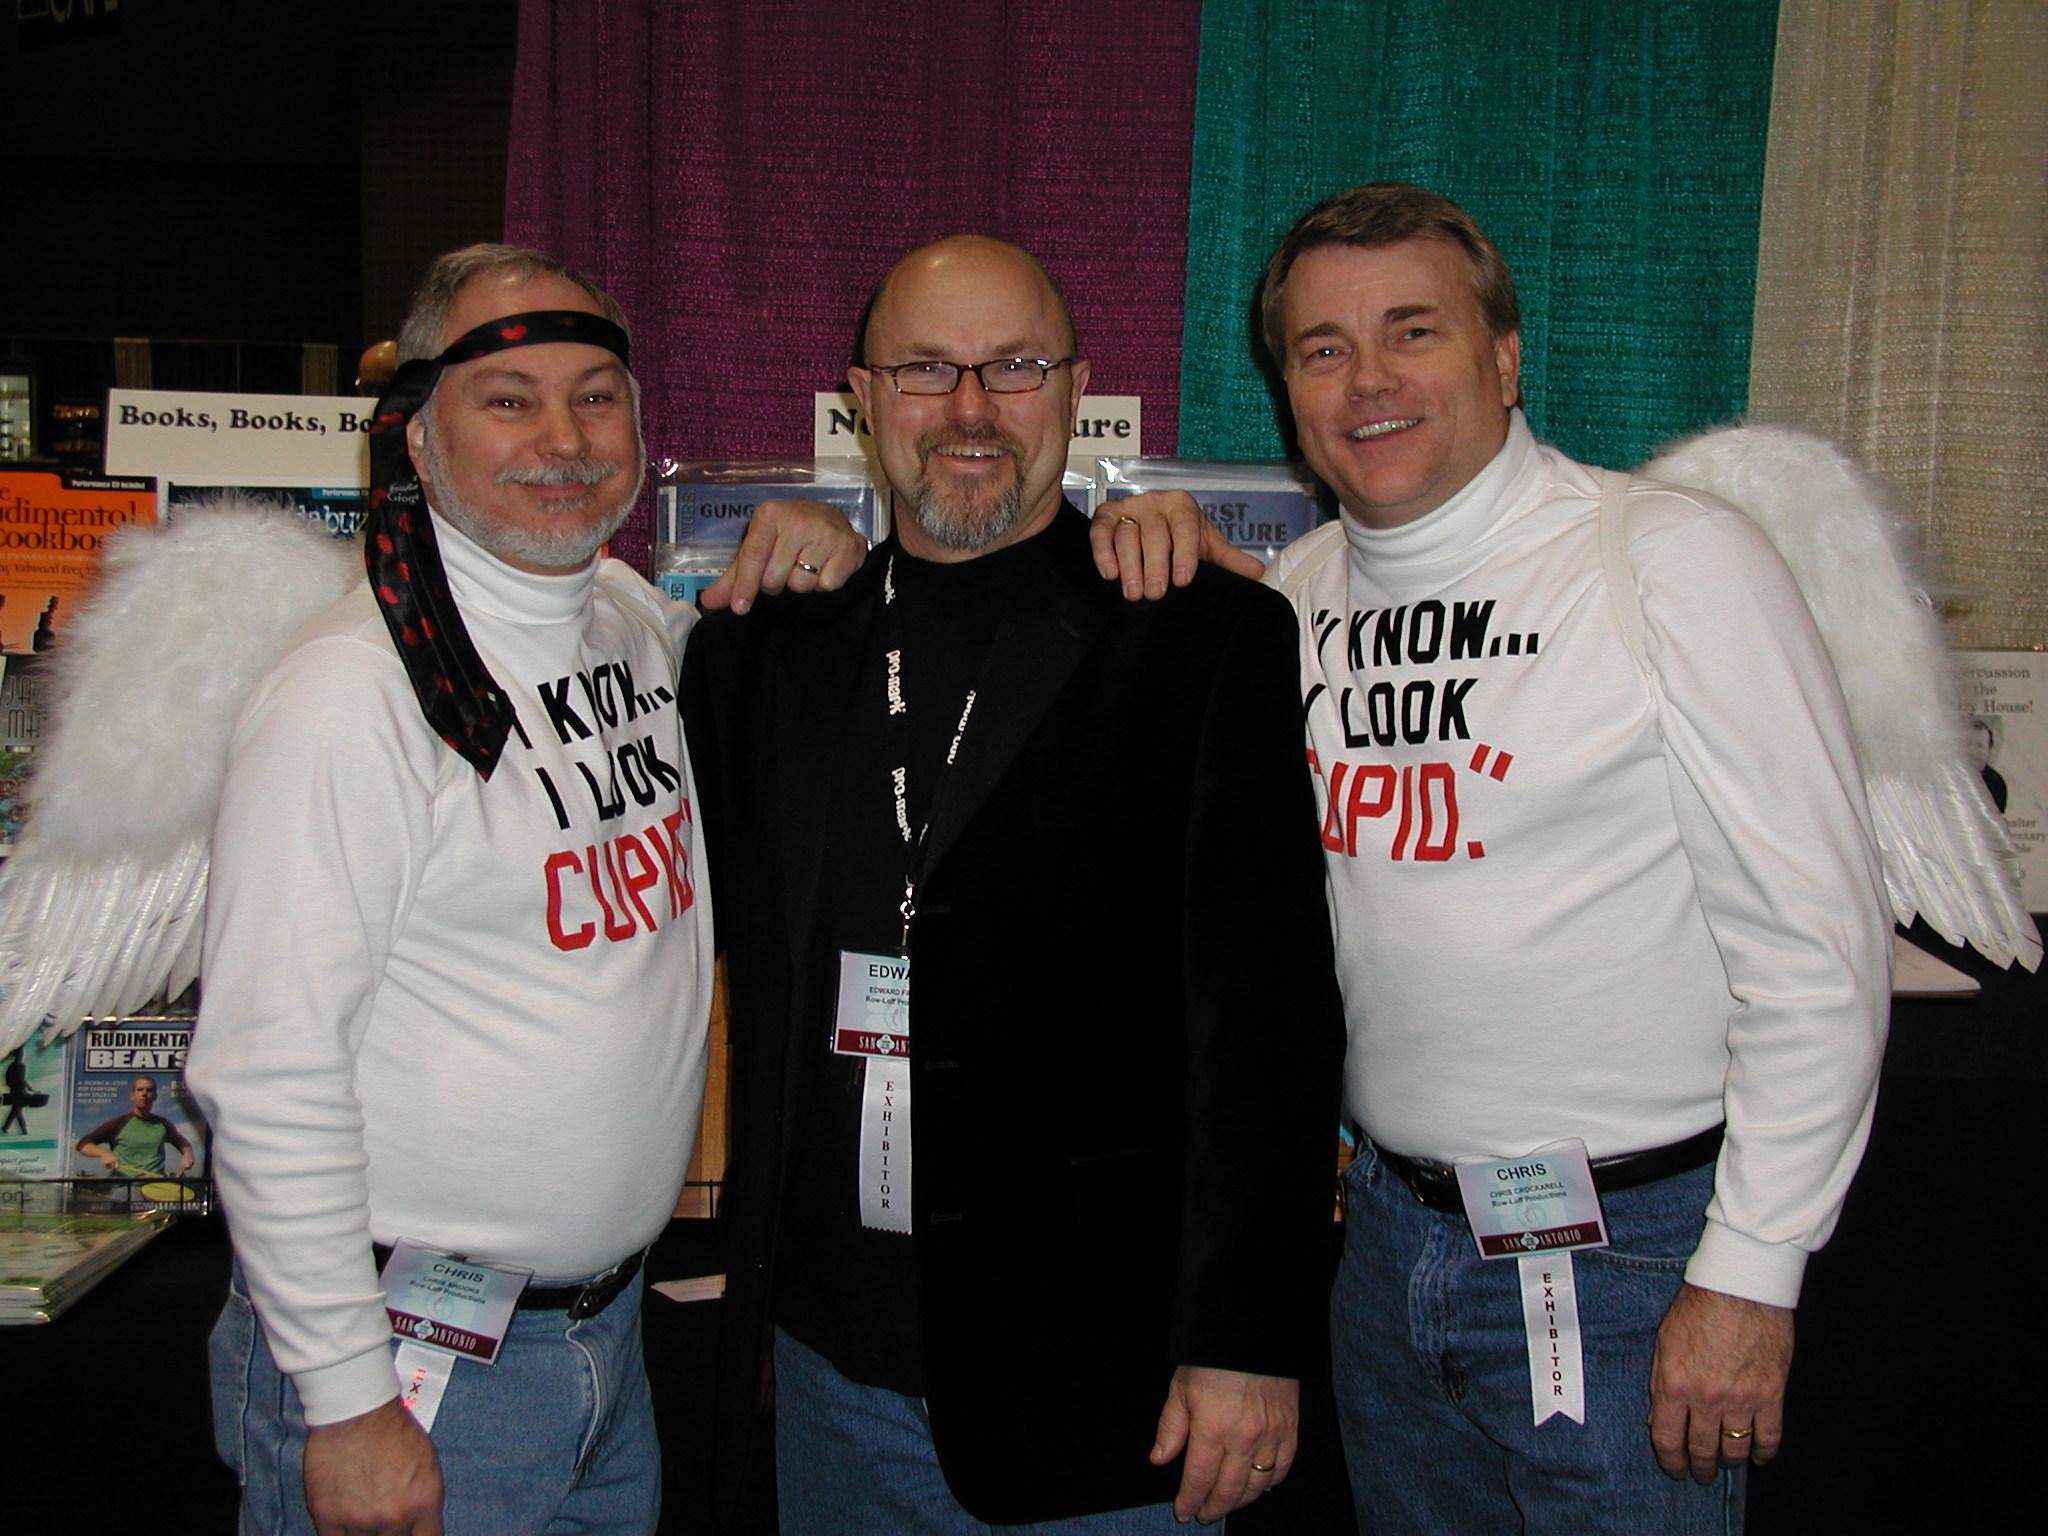 Edward with Chris Brooks and Chris Crockarell, 2009